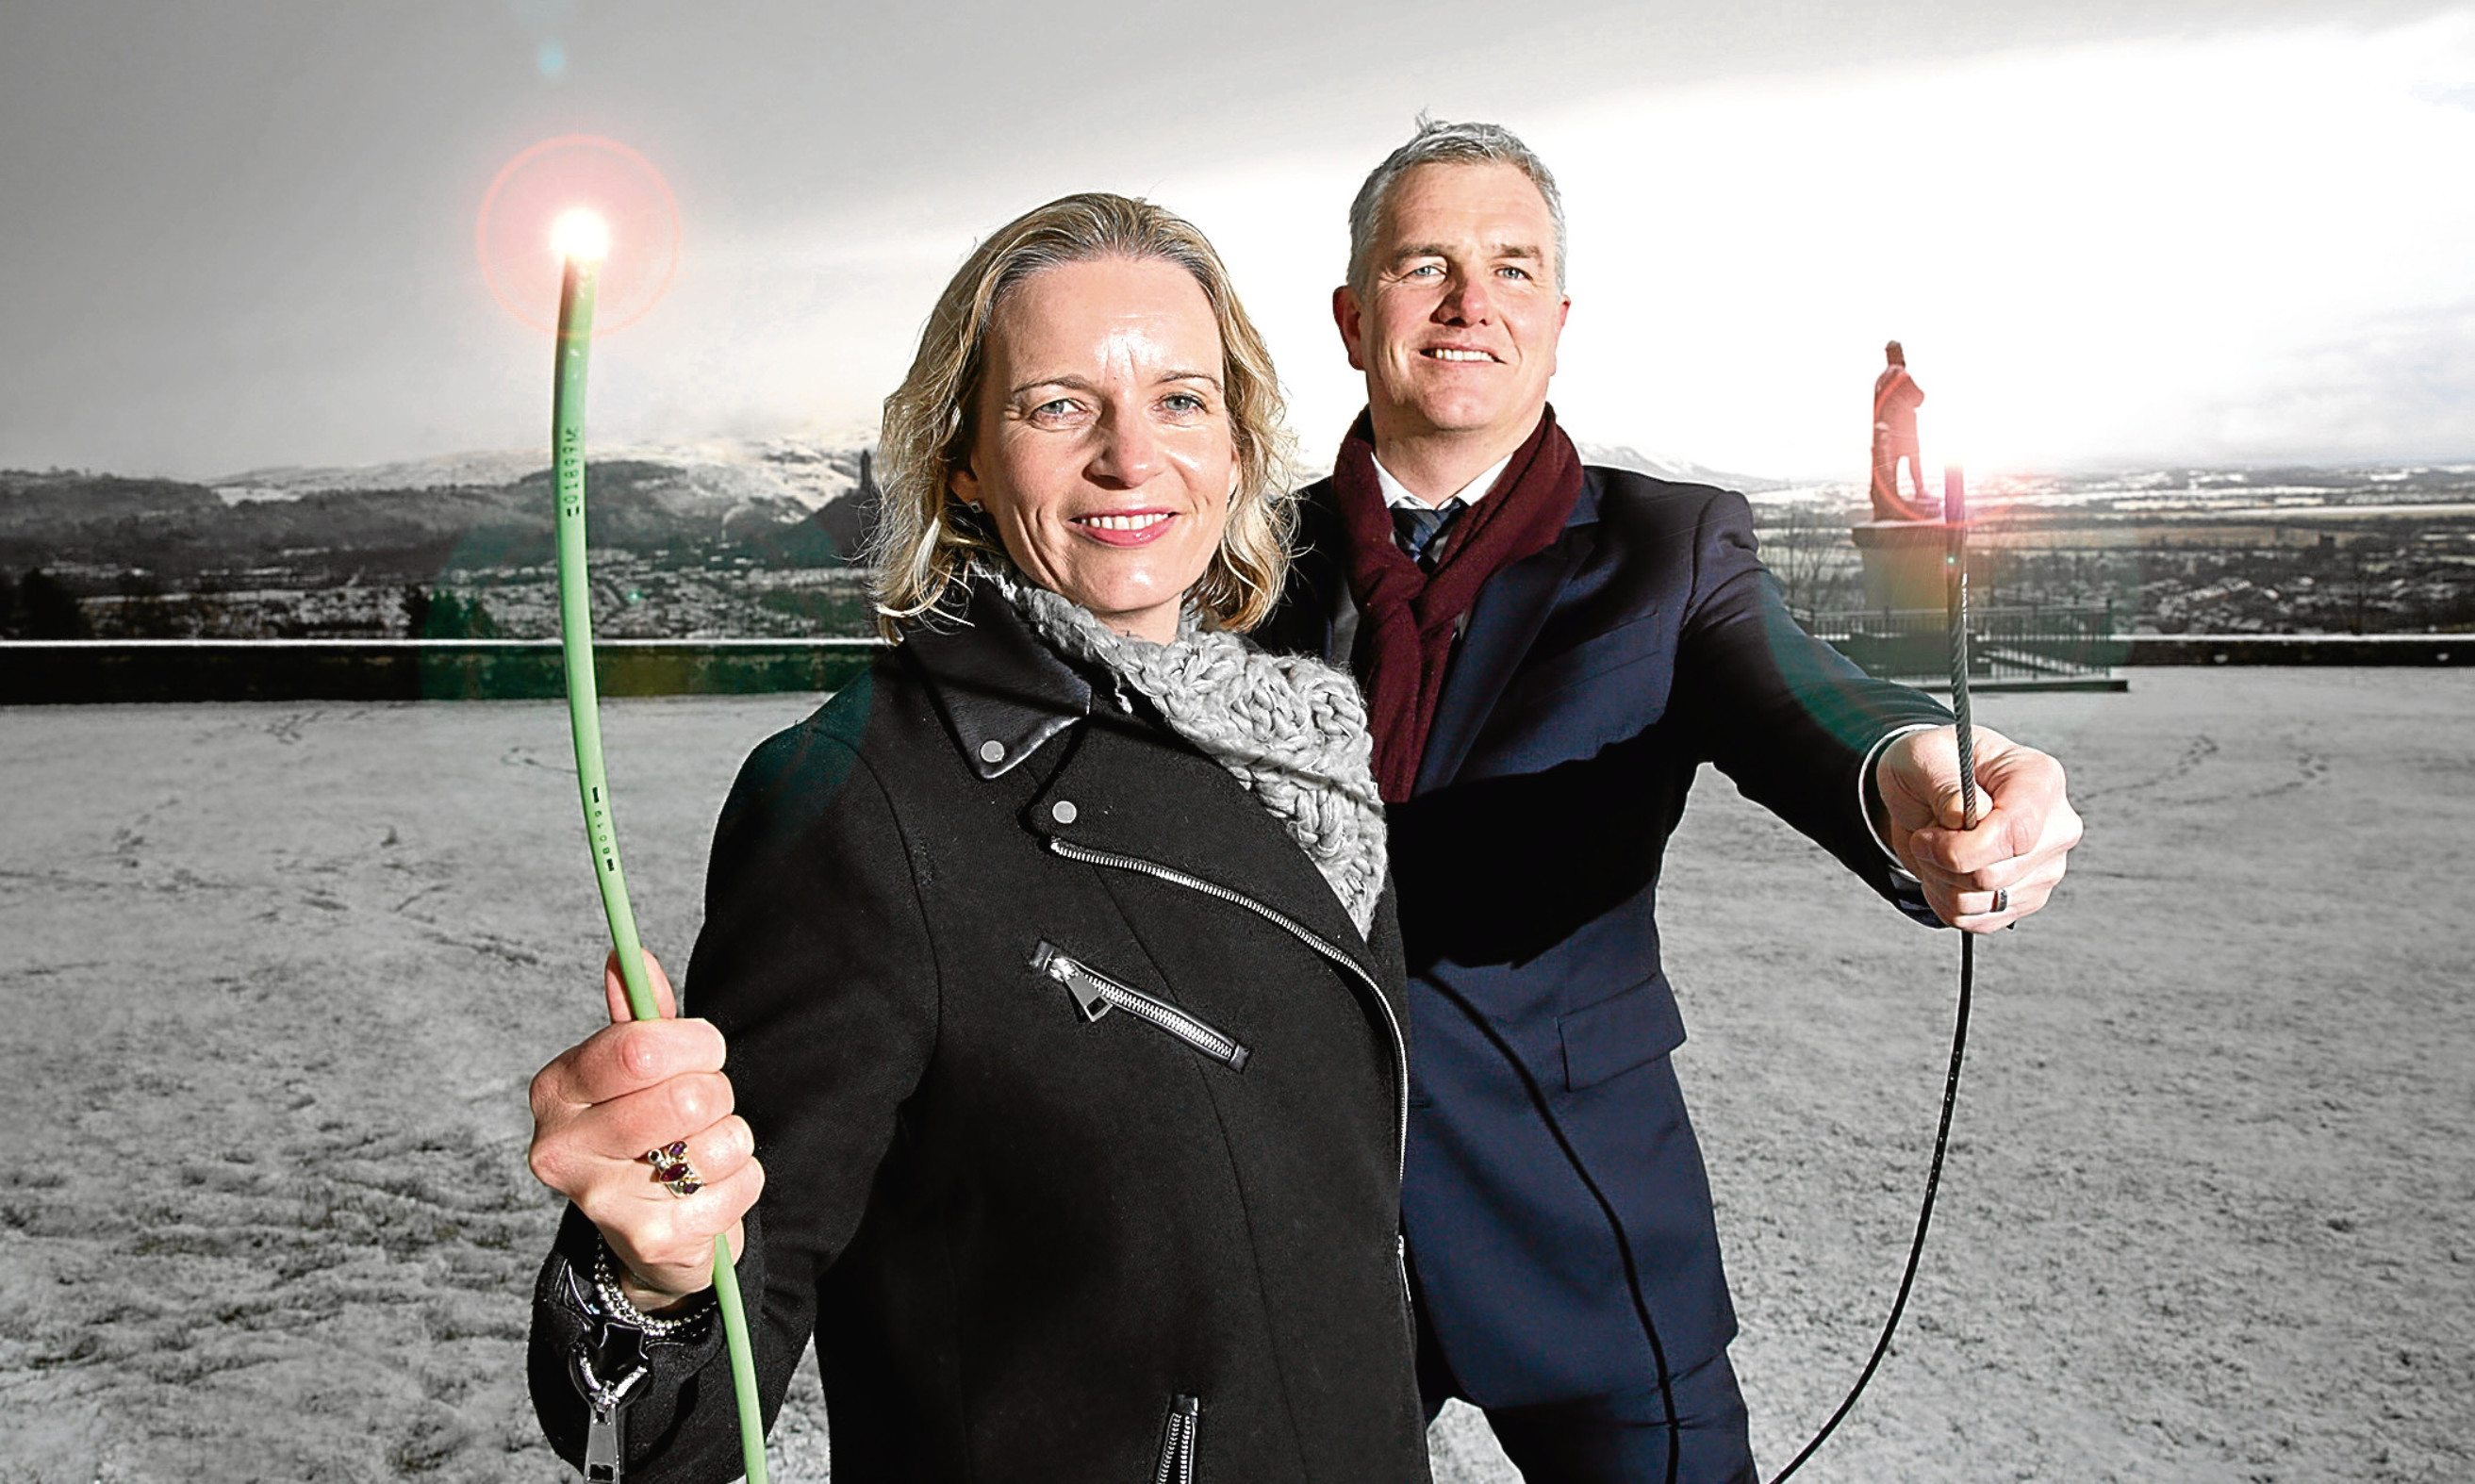 James McClafferty, CityFibre's Head of Regional Development in Scotland with Stirling Council Leader Johanna Boyd